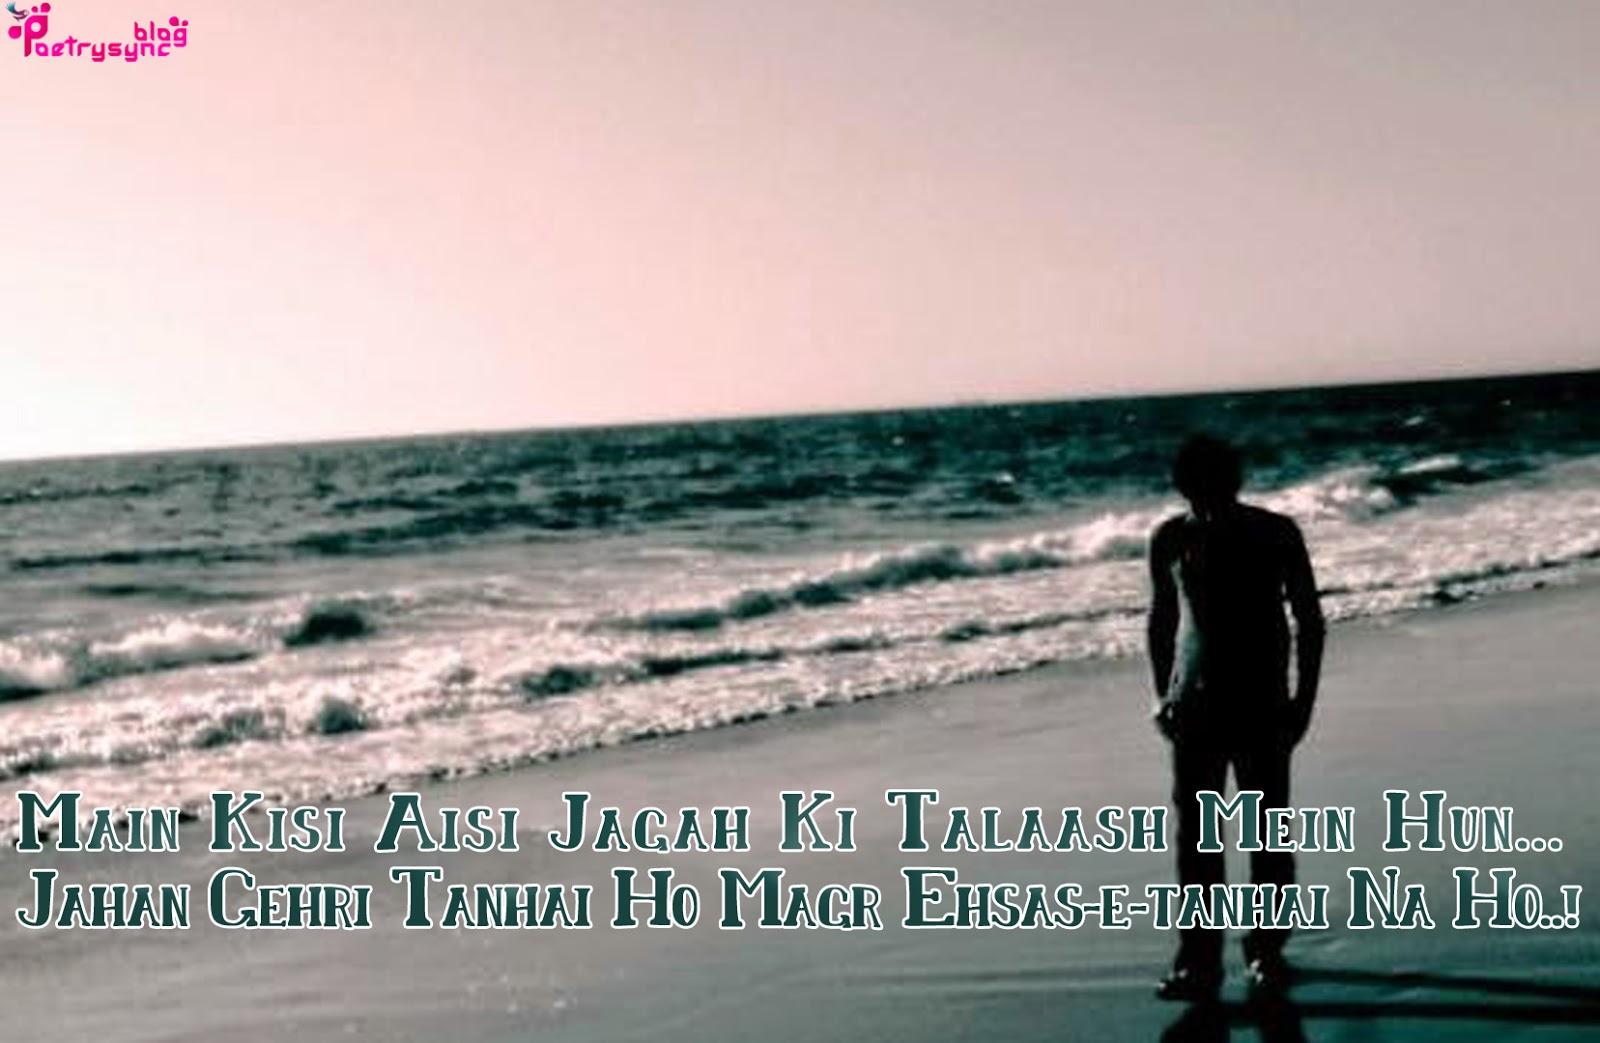 Tanhai Hindi Sad Sms Shayari For Facebook With Sad Girl Hd Images